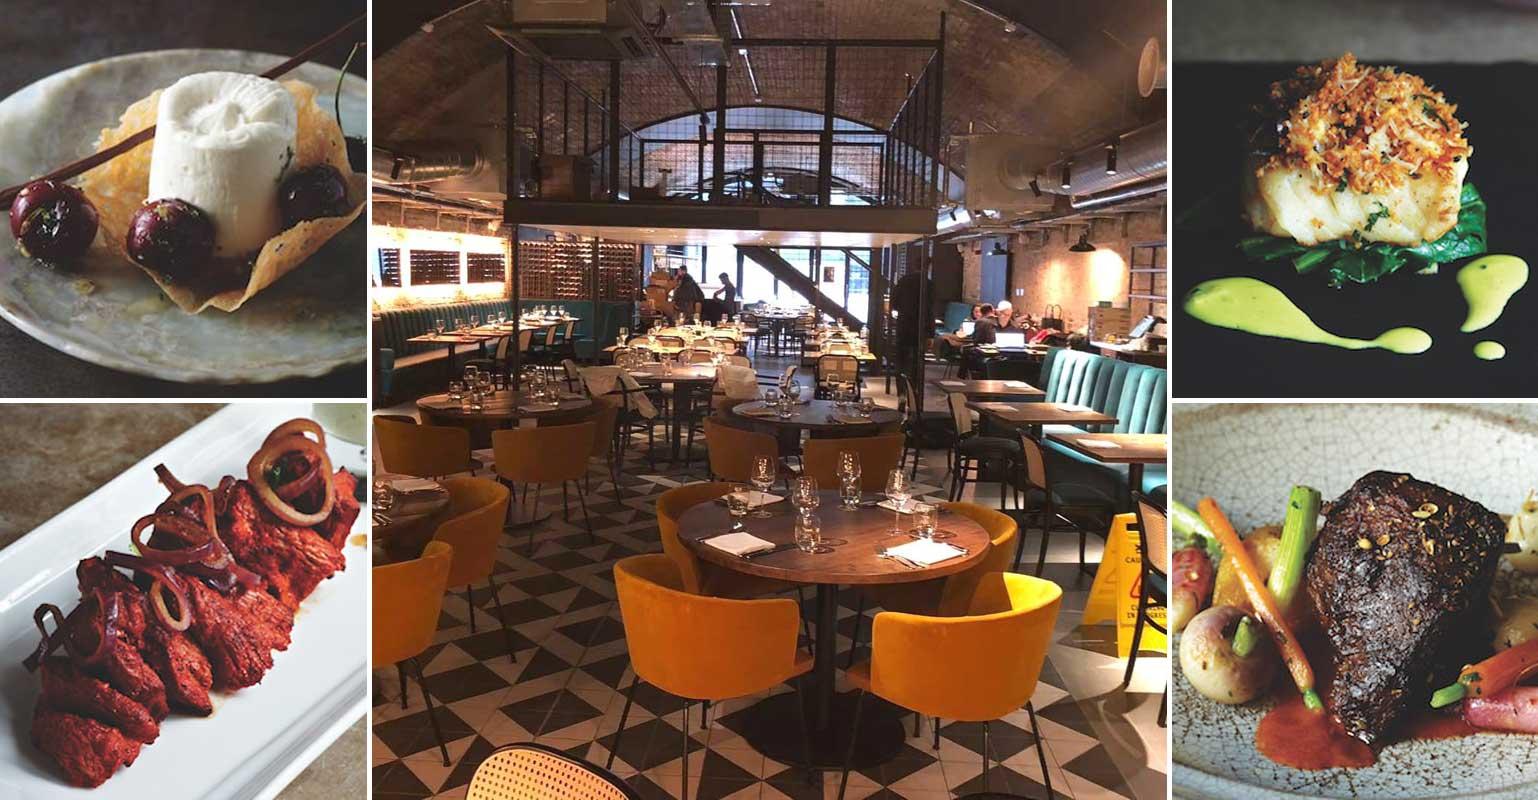 Cinnamon Kitchen Opens 12 March in Battersea Power Station